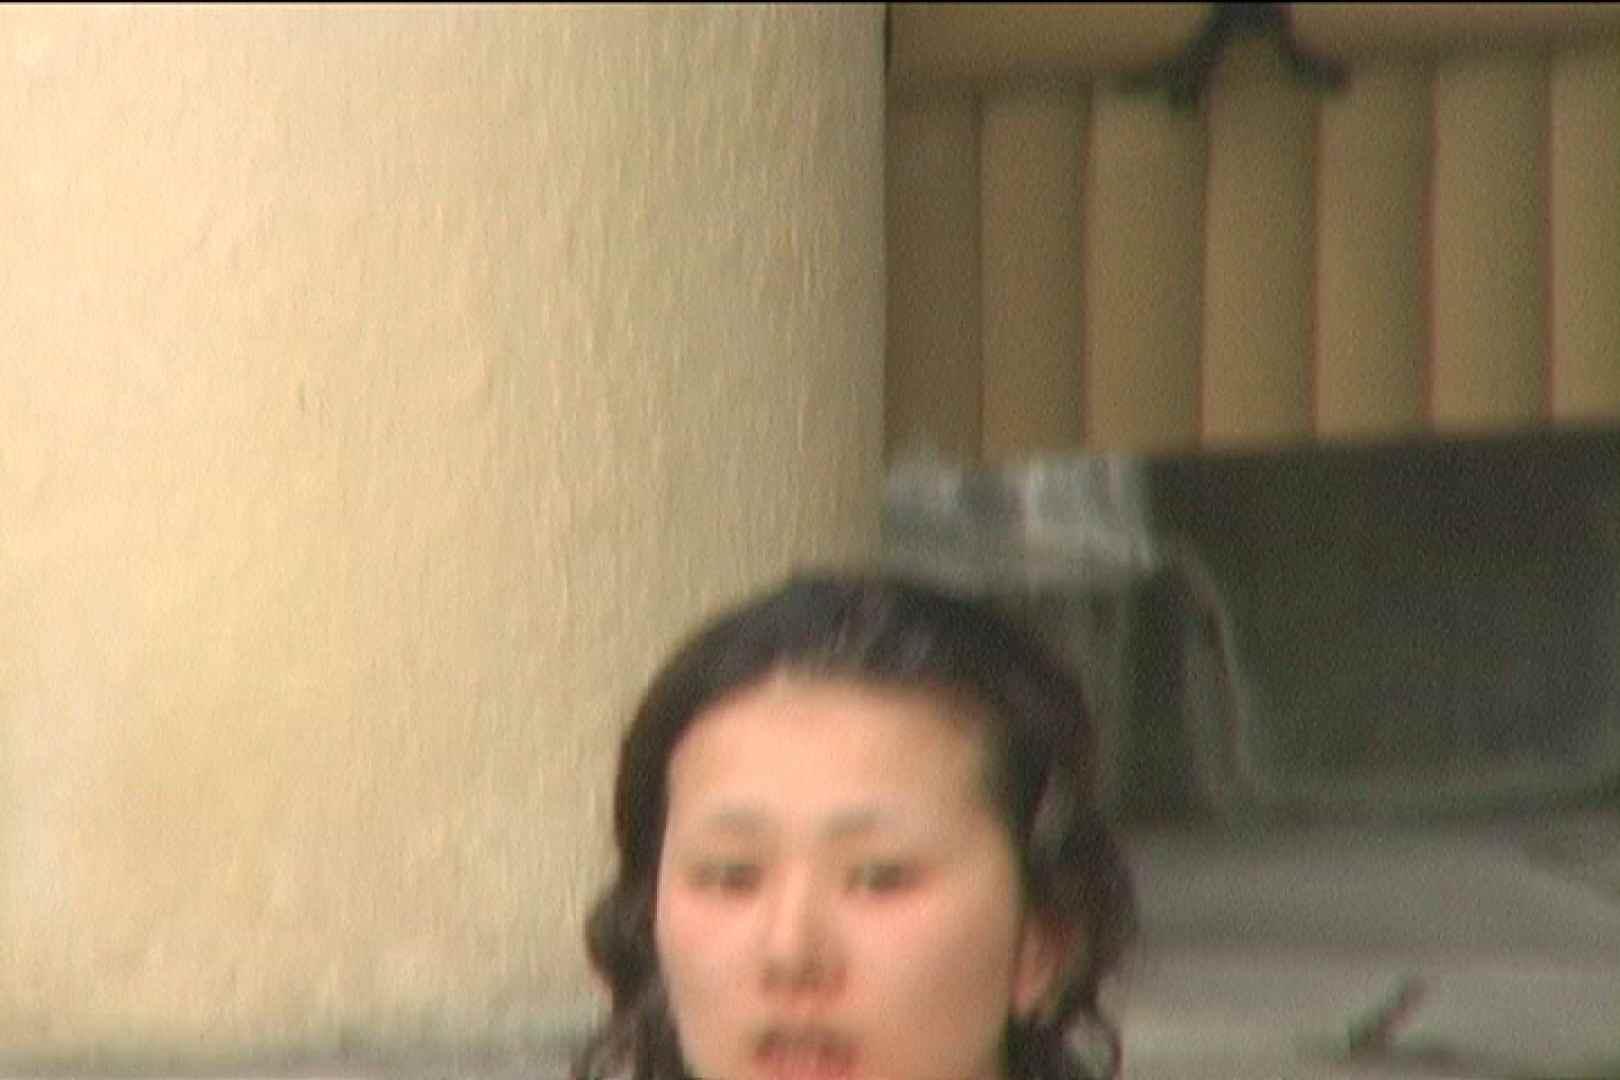 Aquaな露天風呂Vol.131 女体盗撮 覗きスケベ動画紹介 82連発 71